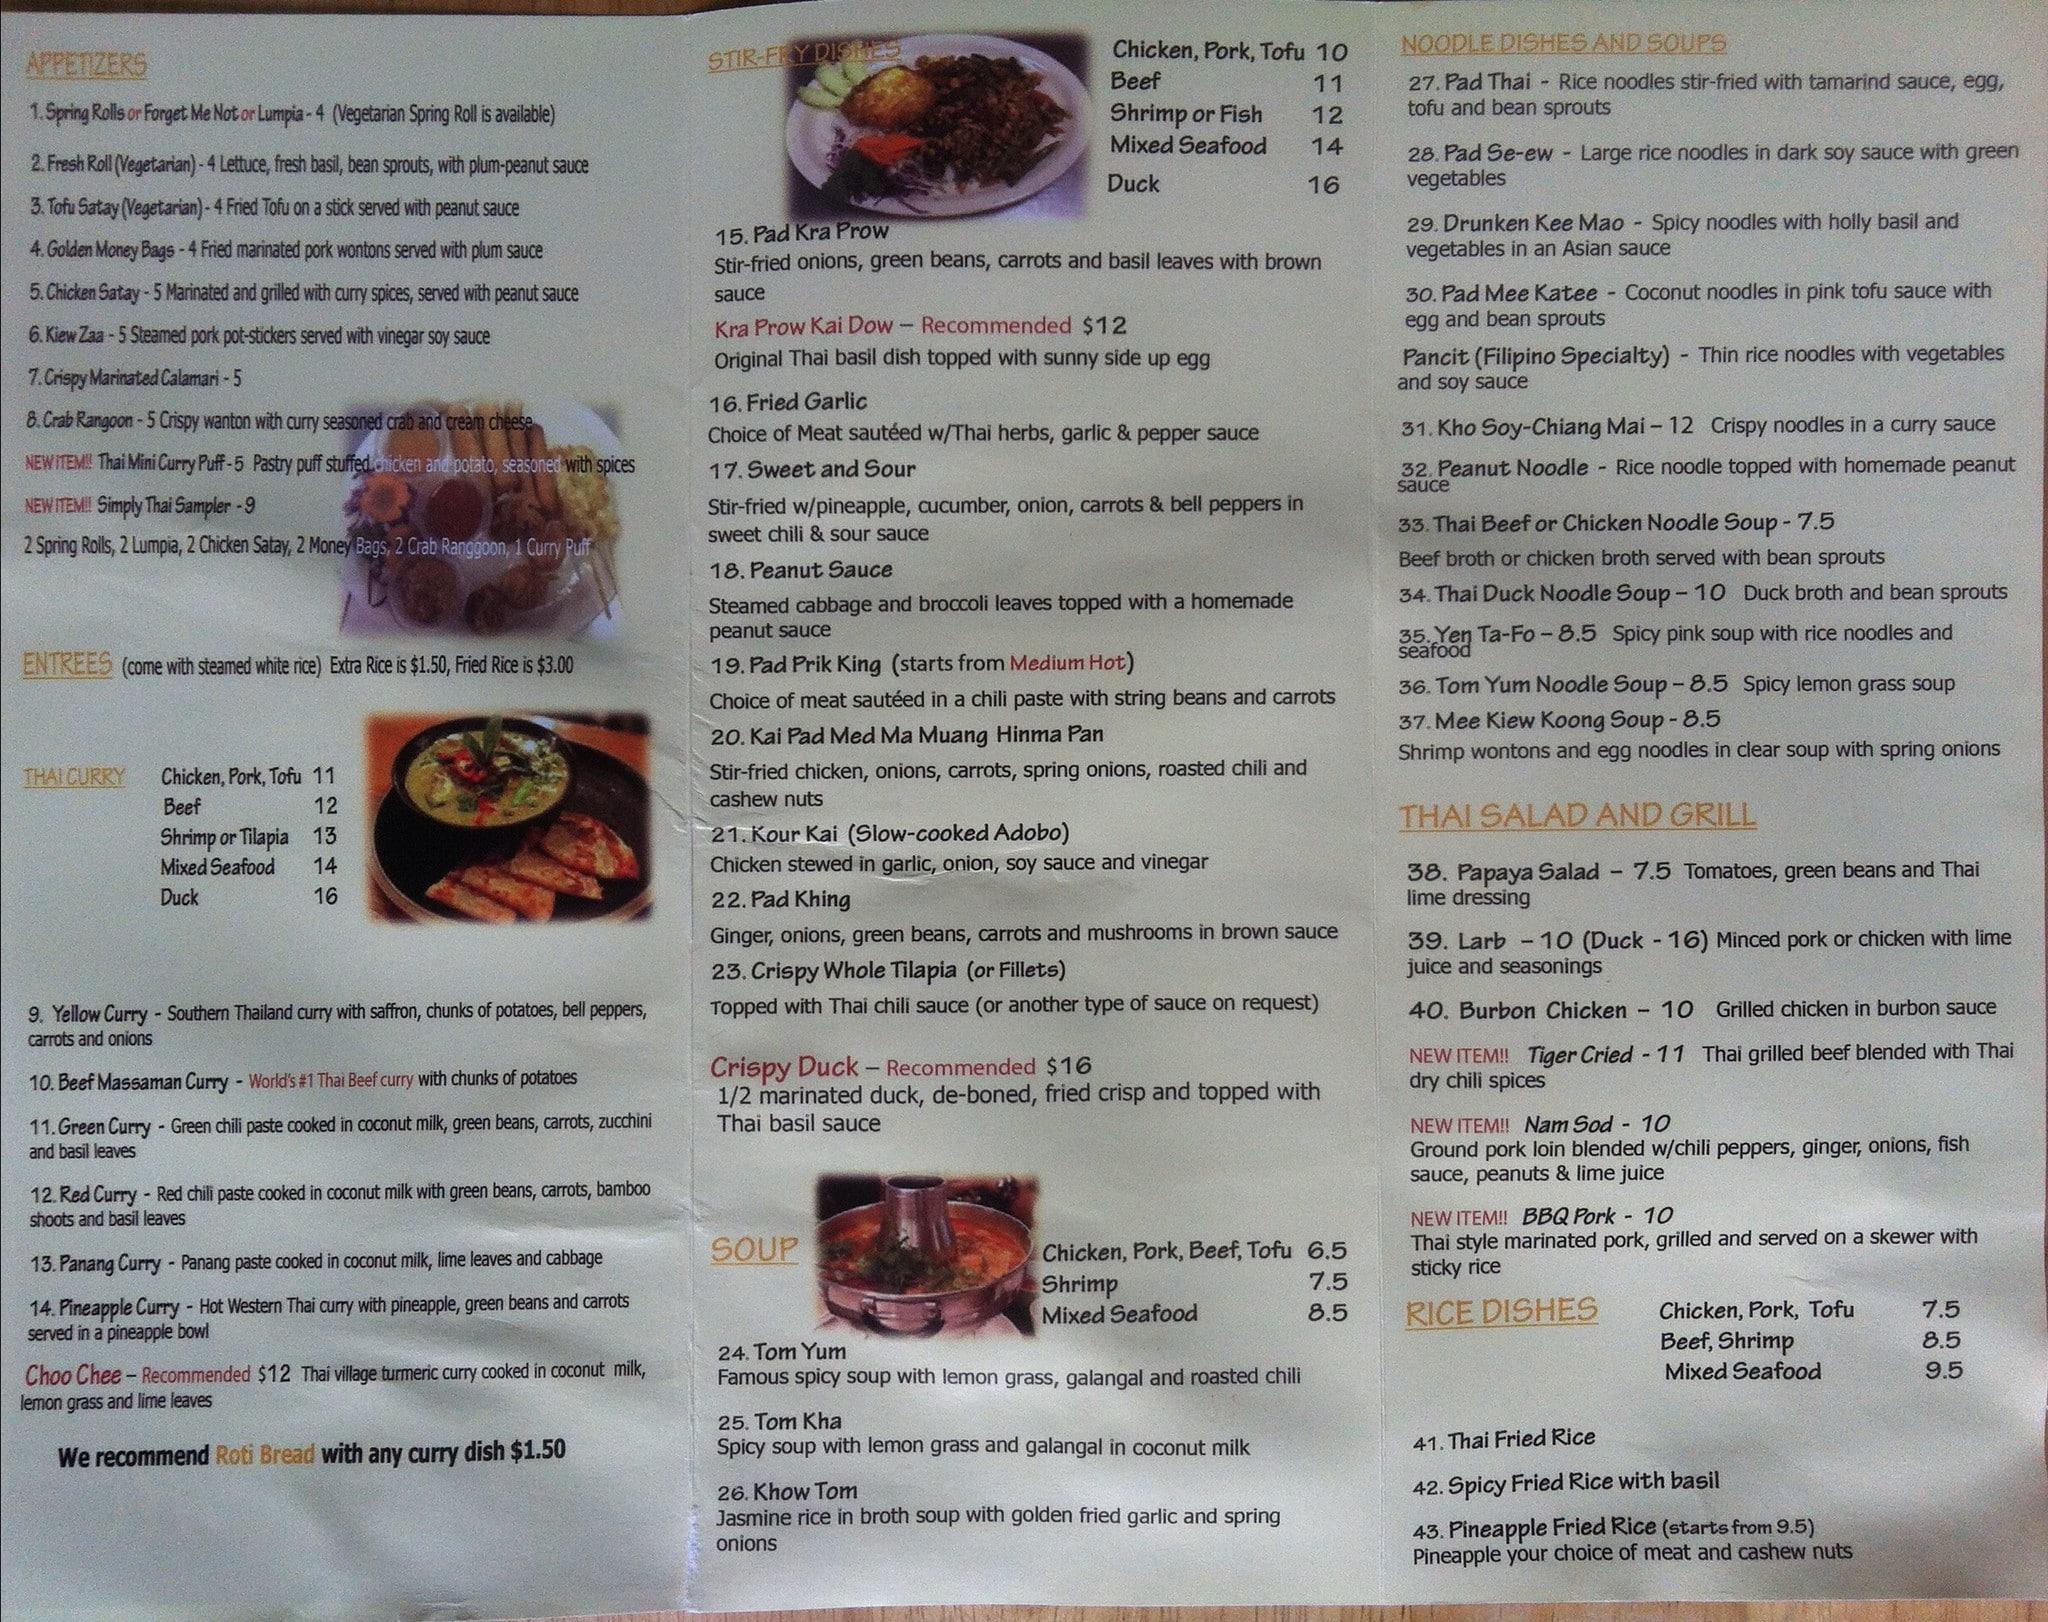 Simply Tasty Thai Menu, Menu for Simply Tasty Thai, Atlantic